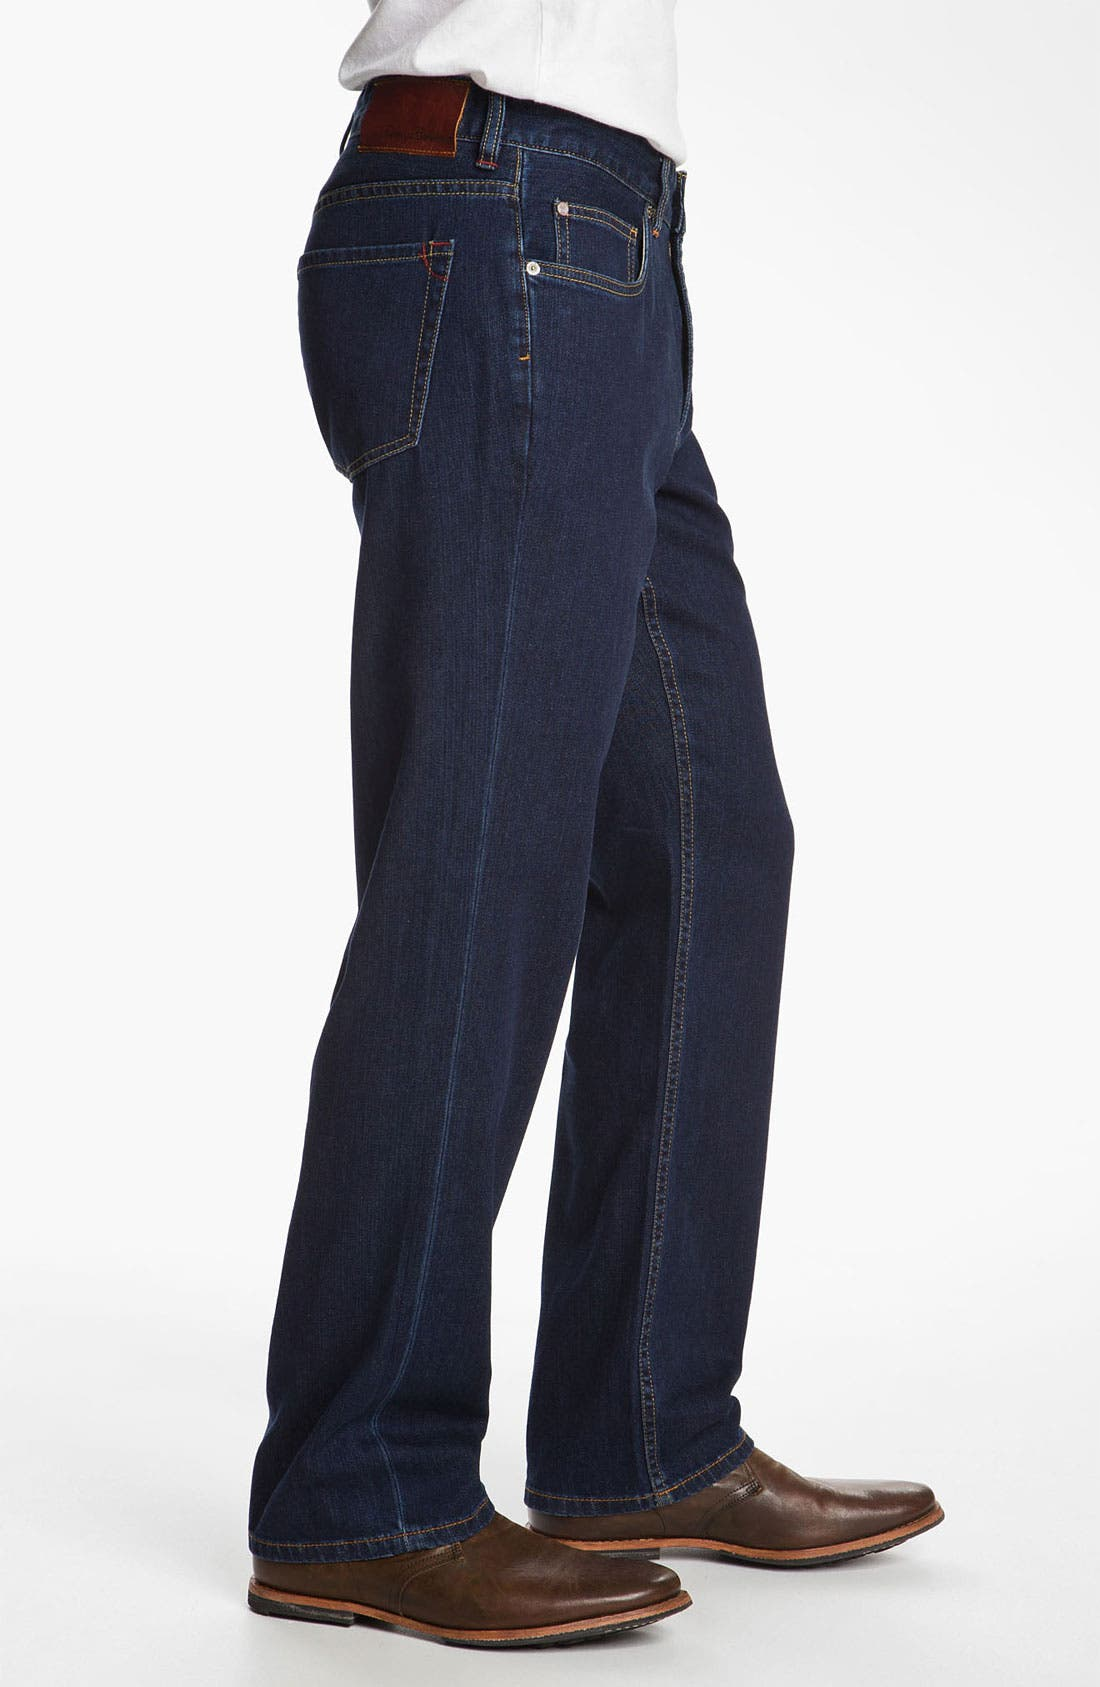 Alternate Image 3  - Tommy Bahama Denim 'Original Cooper' Jeans (New Rinse)